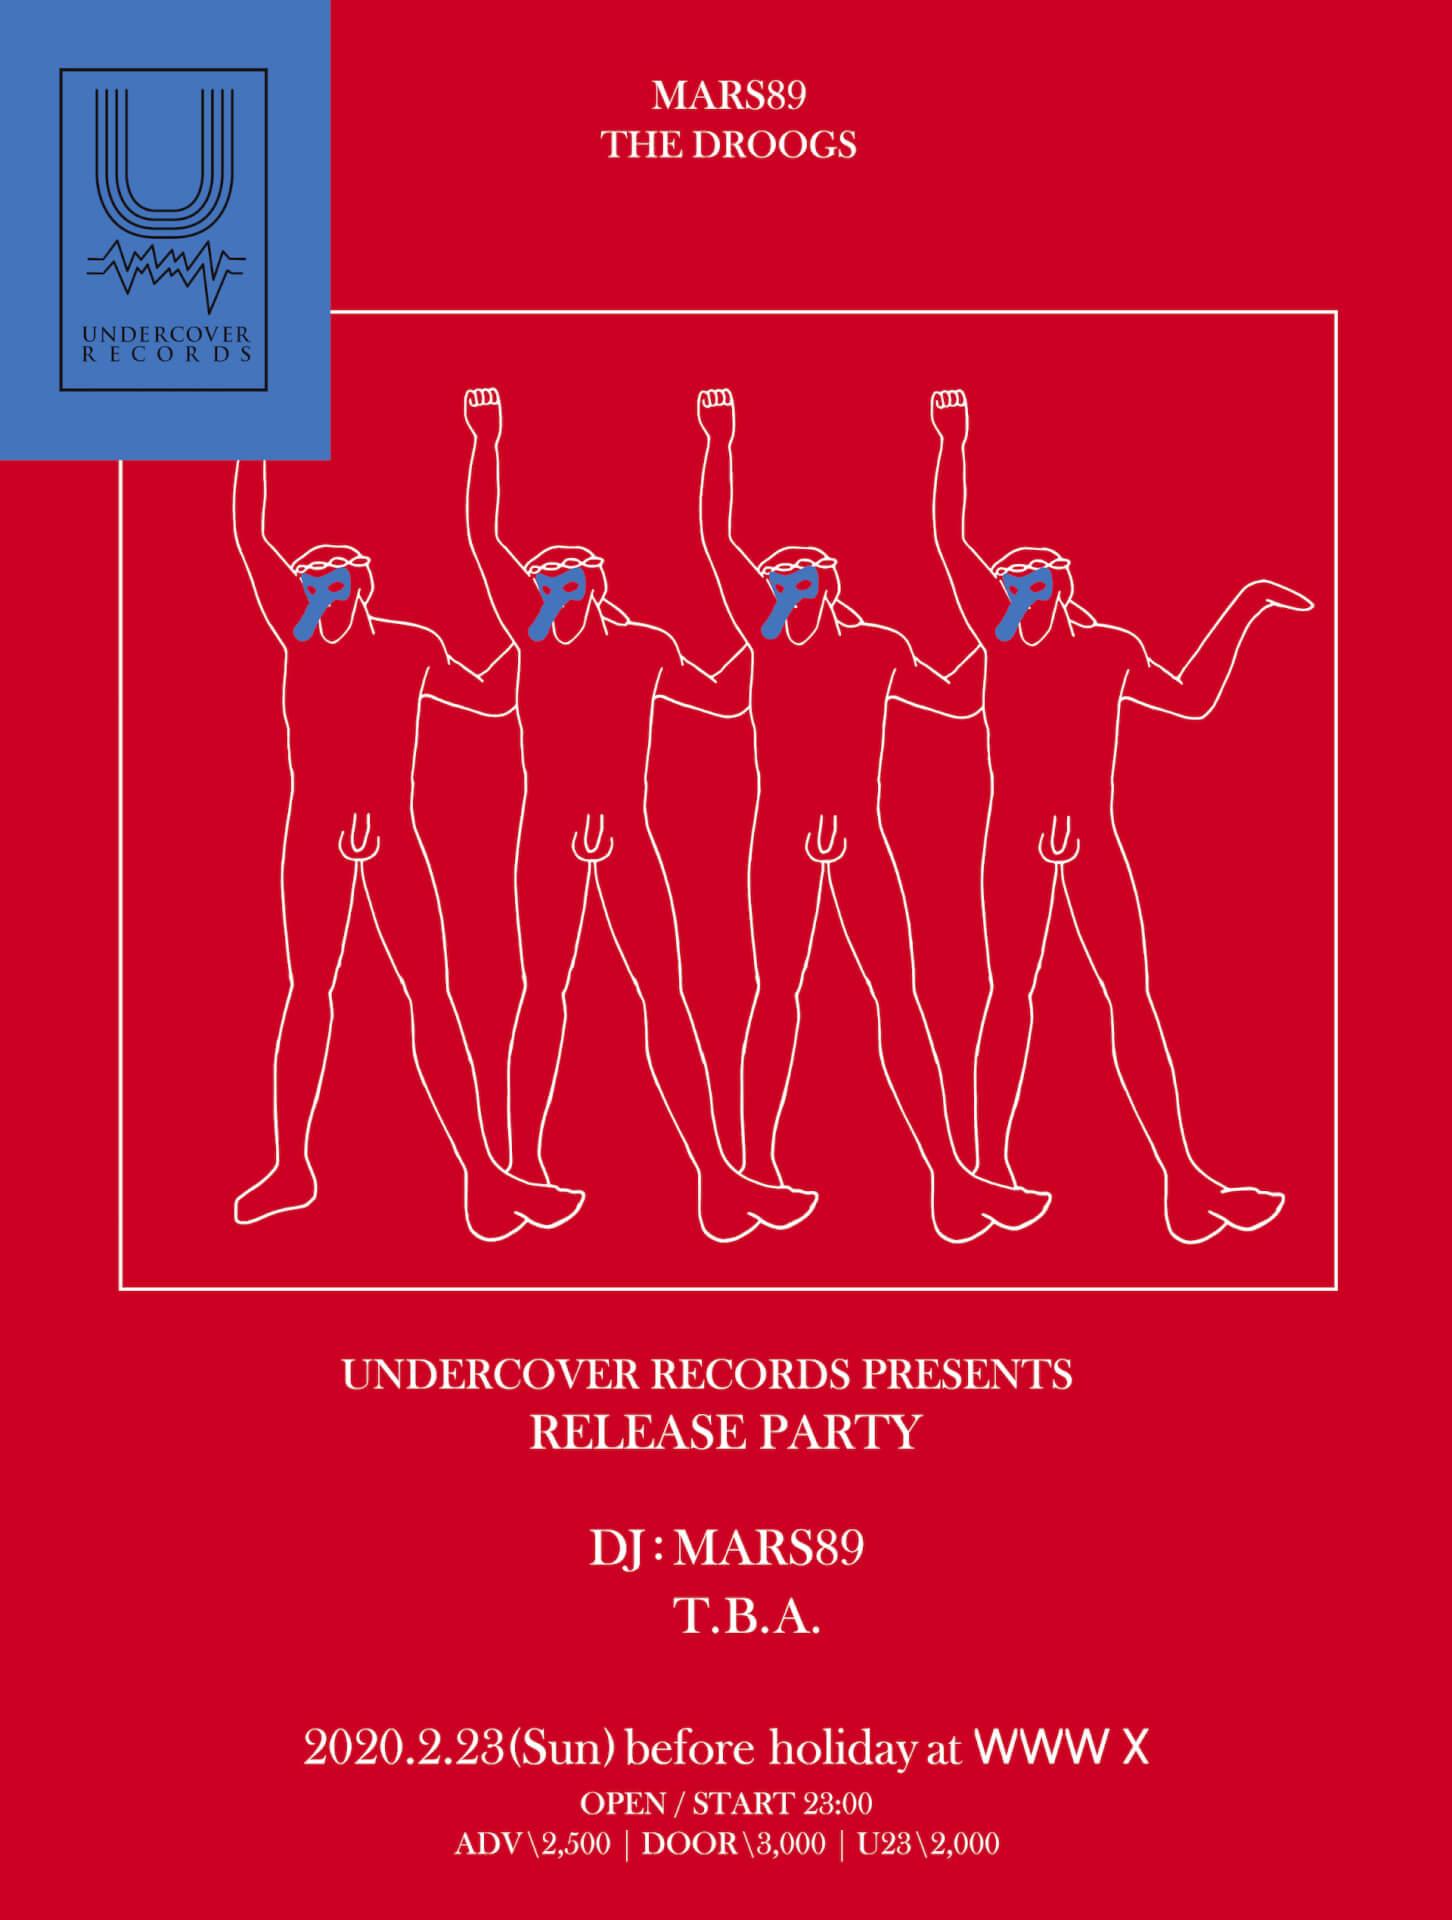 UNDERCOVERのレーベルからリリースのMars89のアルバム『THE DROOGS』リリース・パーティが WWWXで開催決定! music191227_mars89thedrooksparty_01